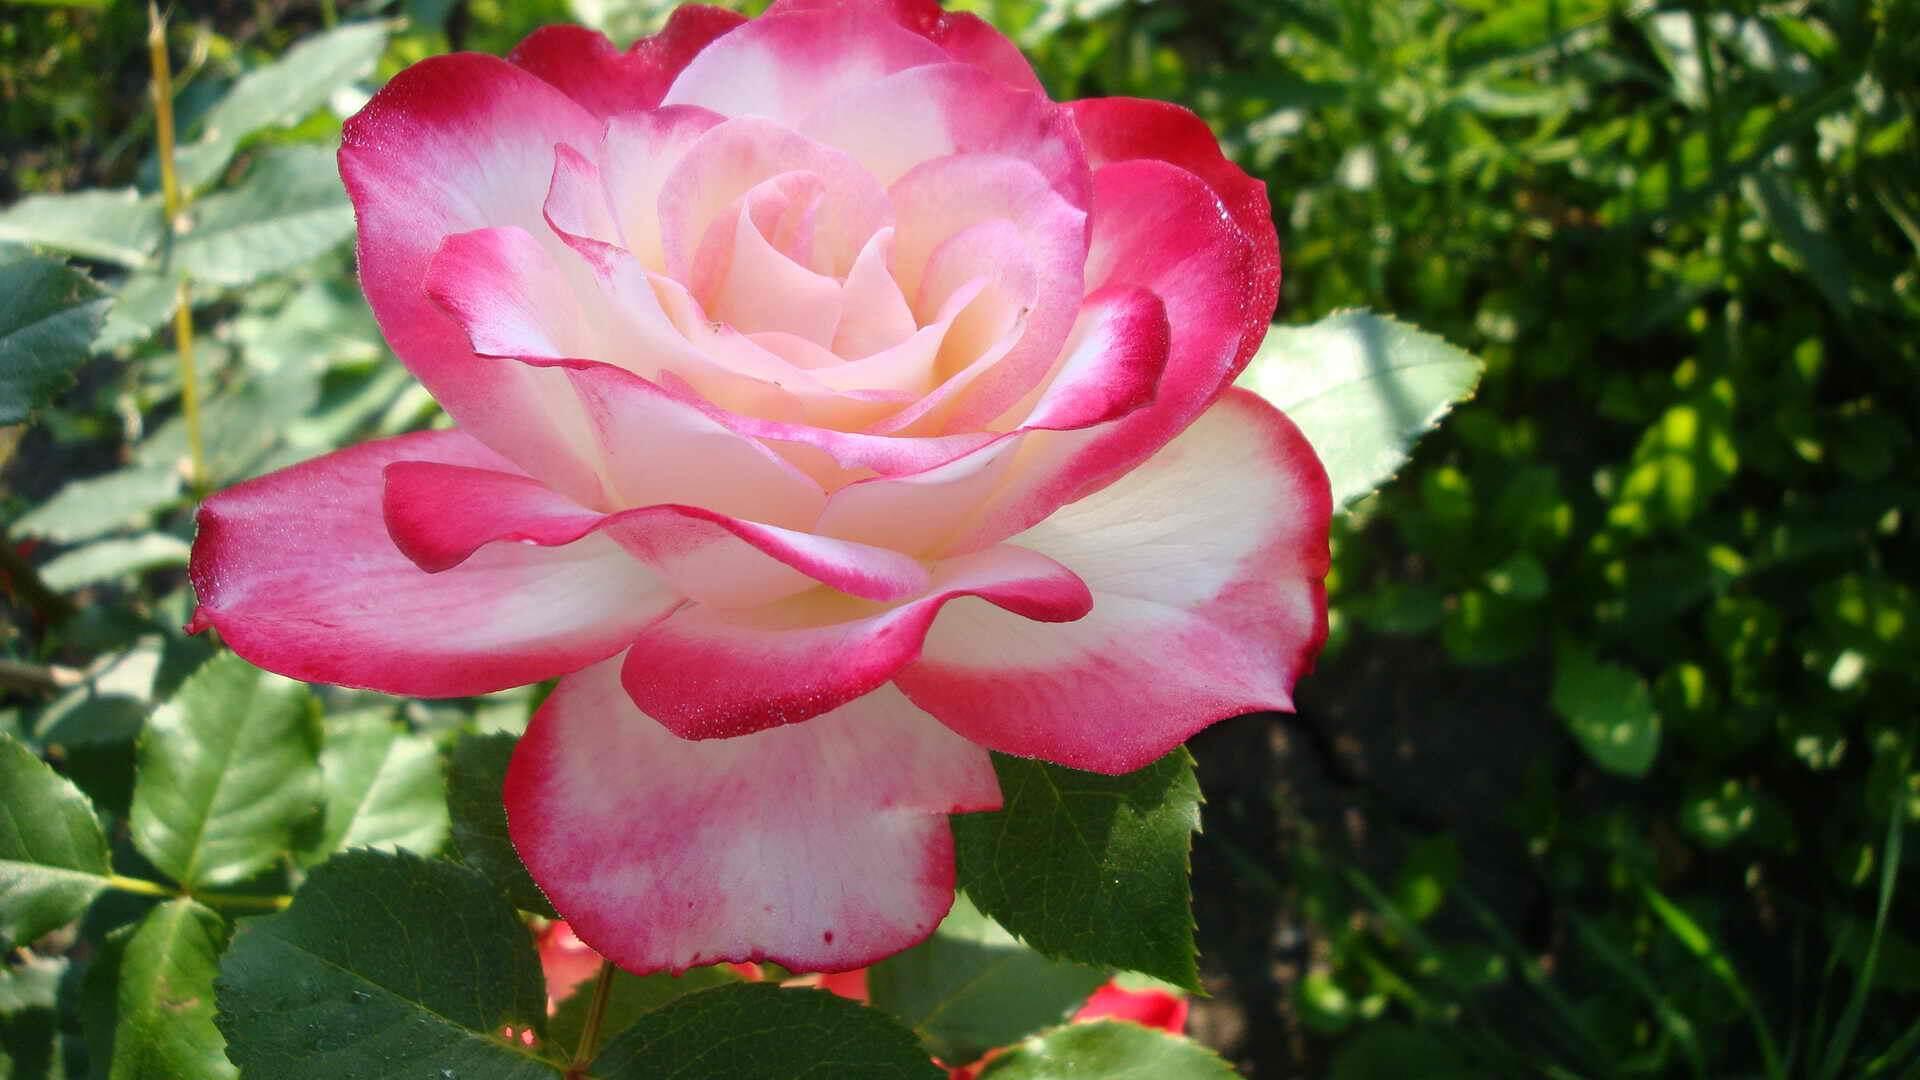 Jubile du Prince de Monaco - роза, совмещающая в себе лед и пламя